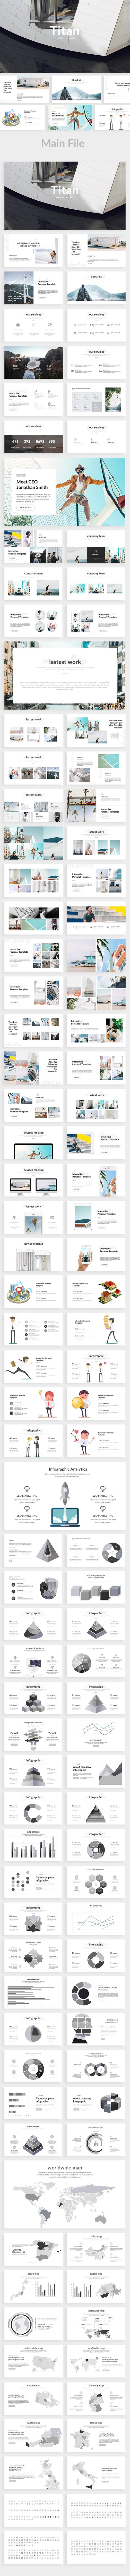 Titan Creative Google Slide Template - Google Slides Presentation Templates